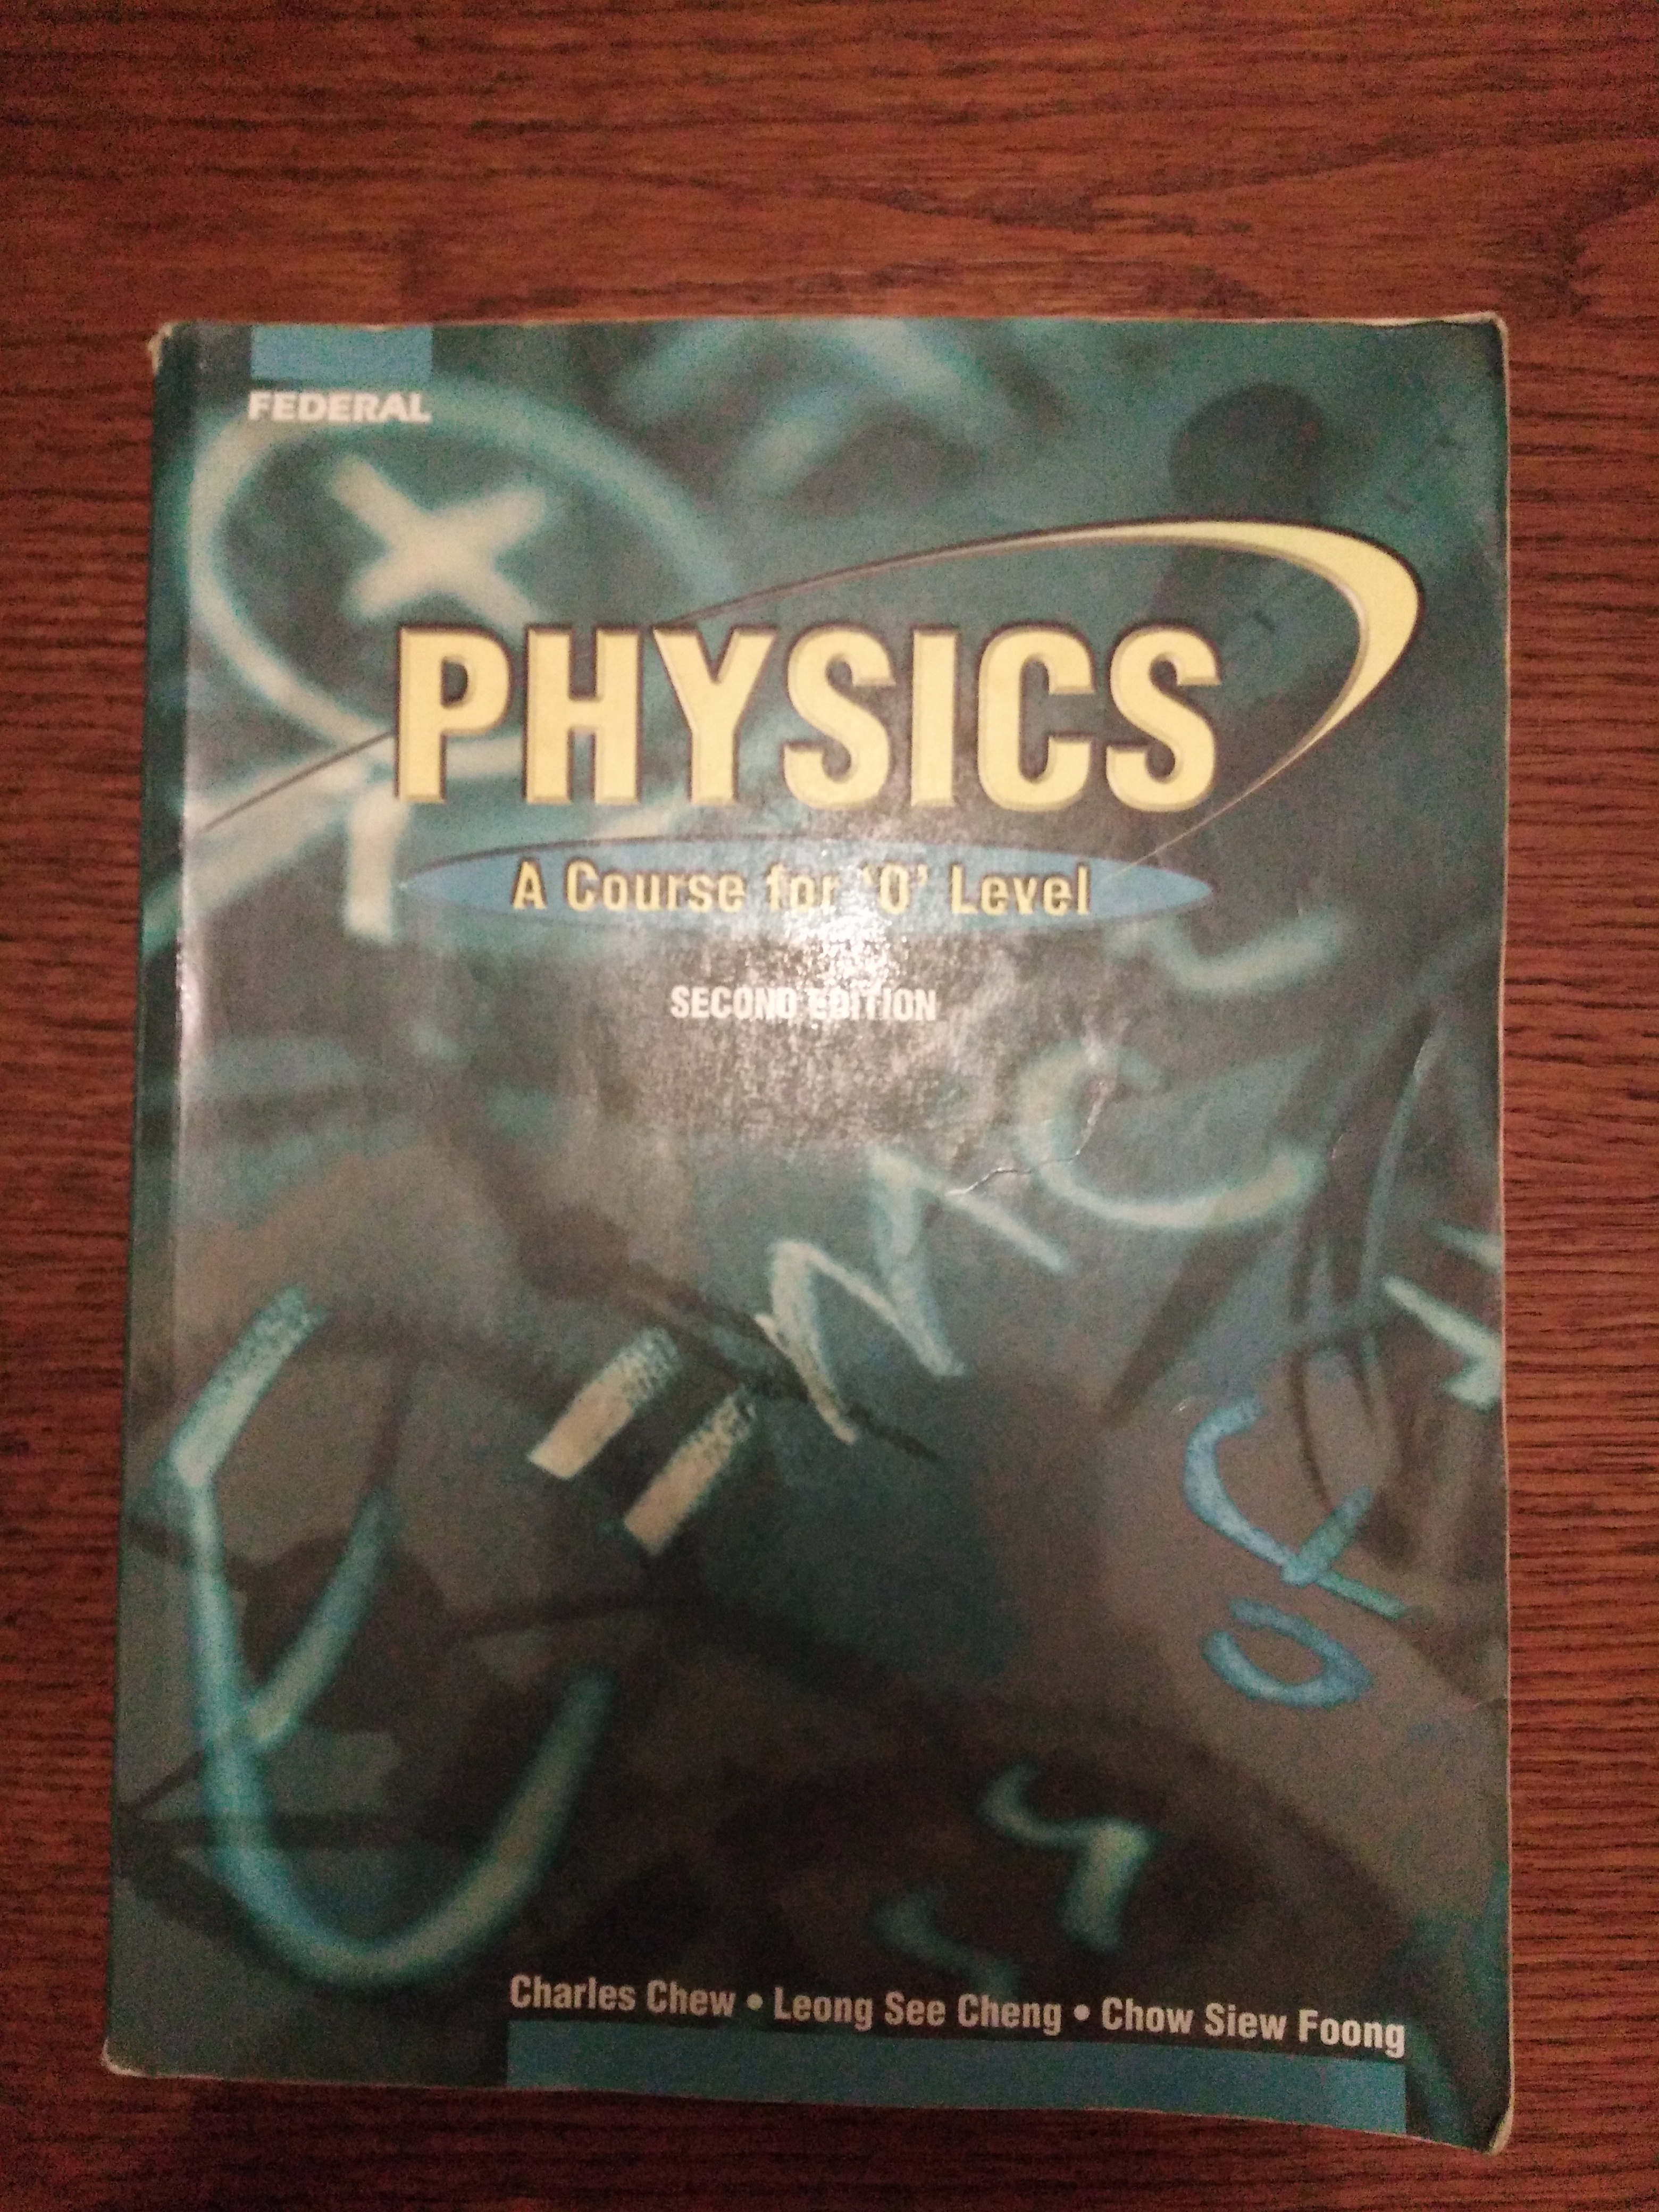 physics: a course for 'o' level